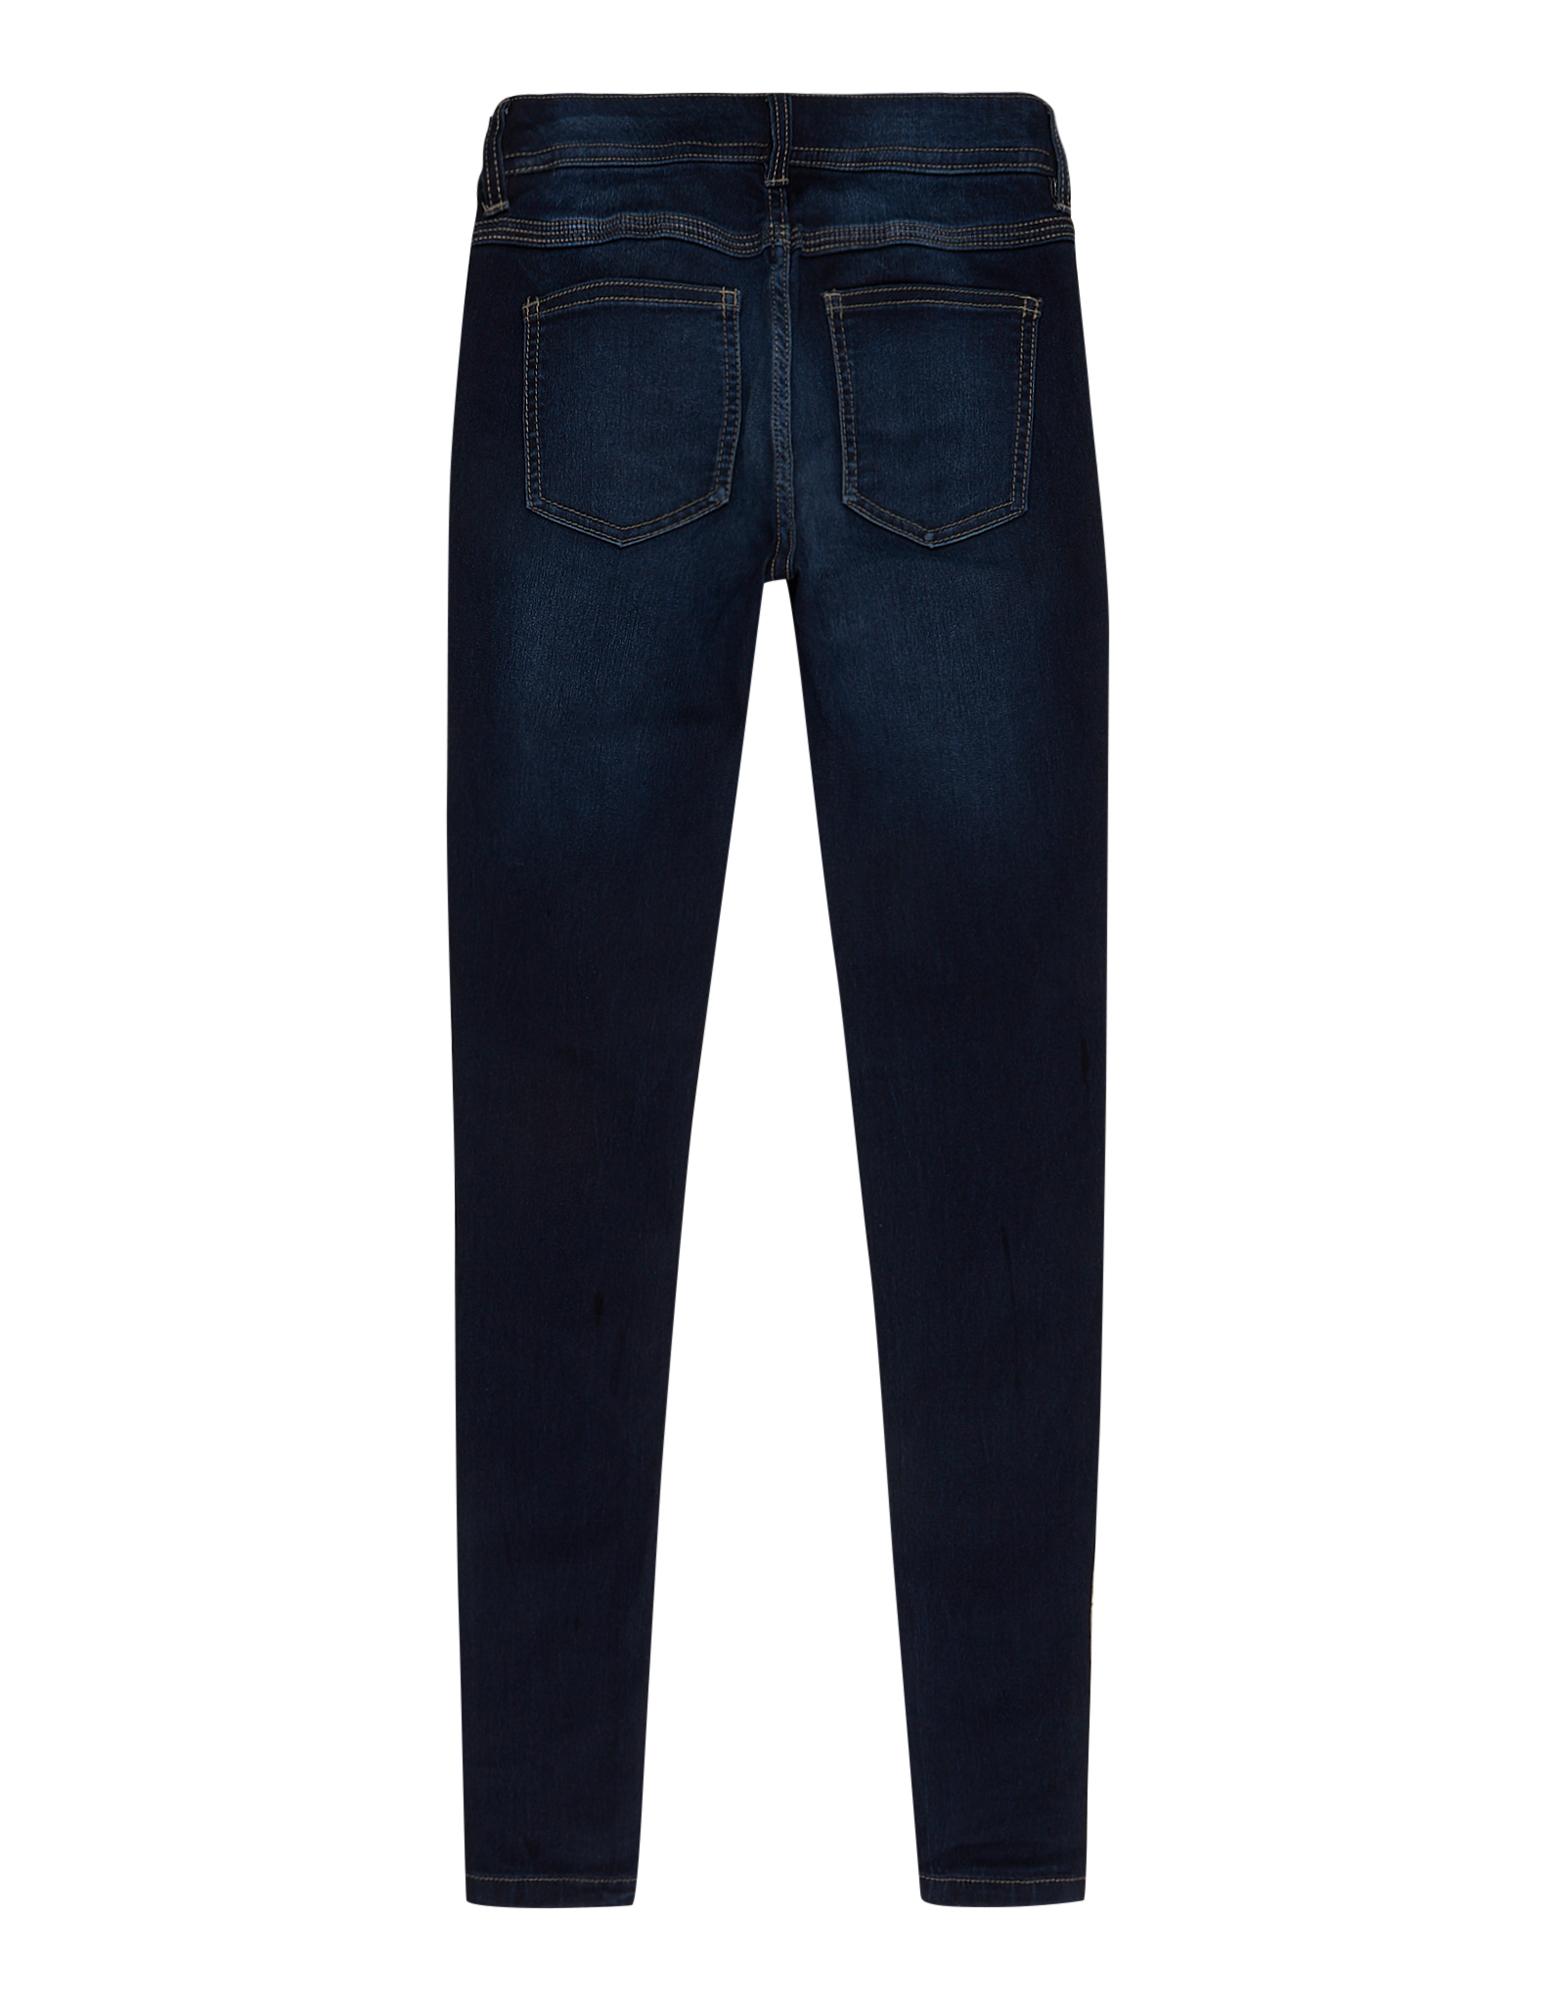 Damen Skinny Fit Jeans mit Knopfleiste Takko Fashion